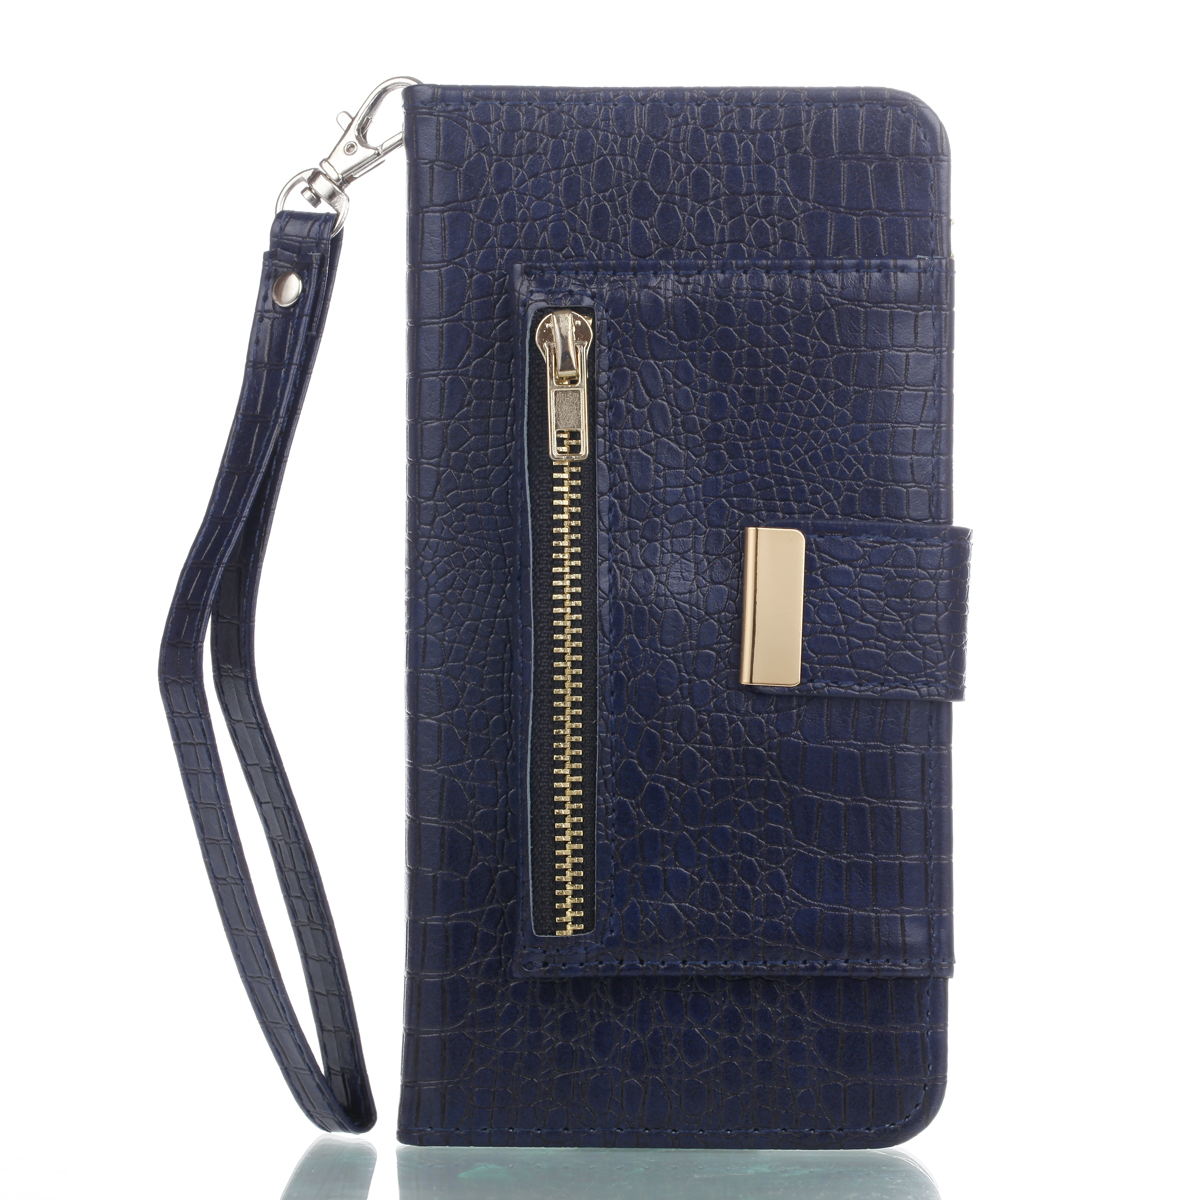 flip for Apple iPhone7 plus iPhone7Plus Luxury comes pocket purse Silica gel Phone Cover intelligent Solid color crocodile Case